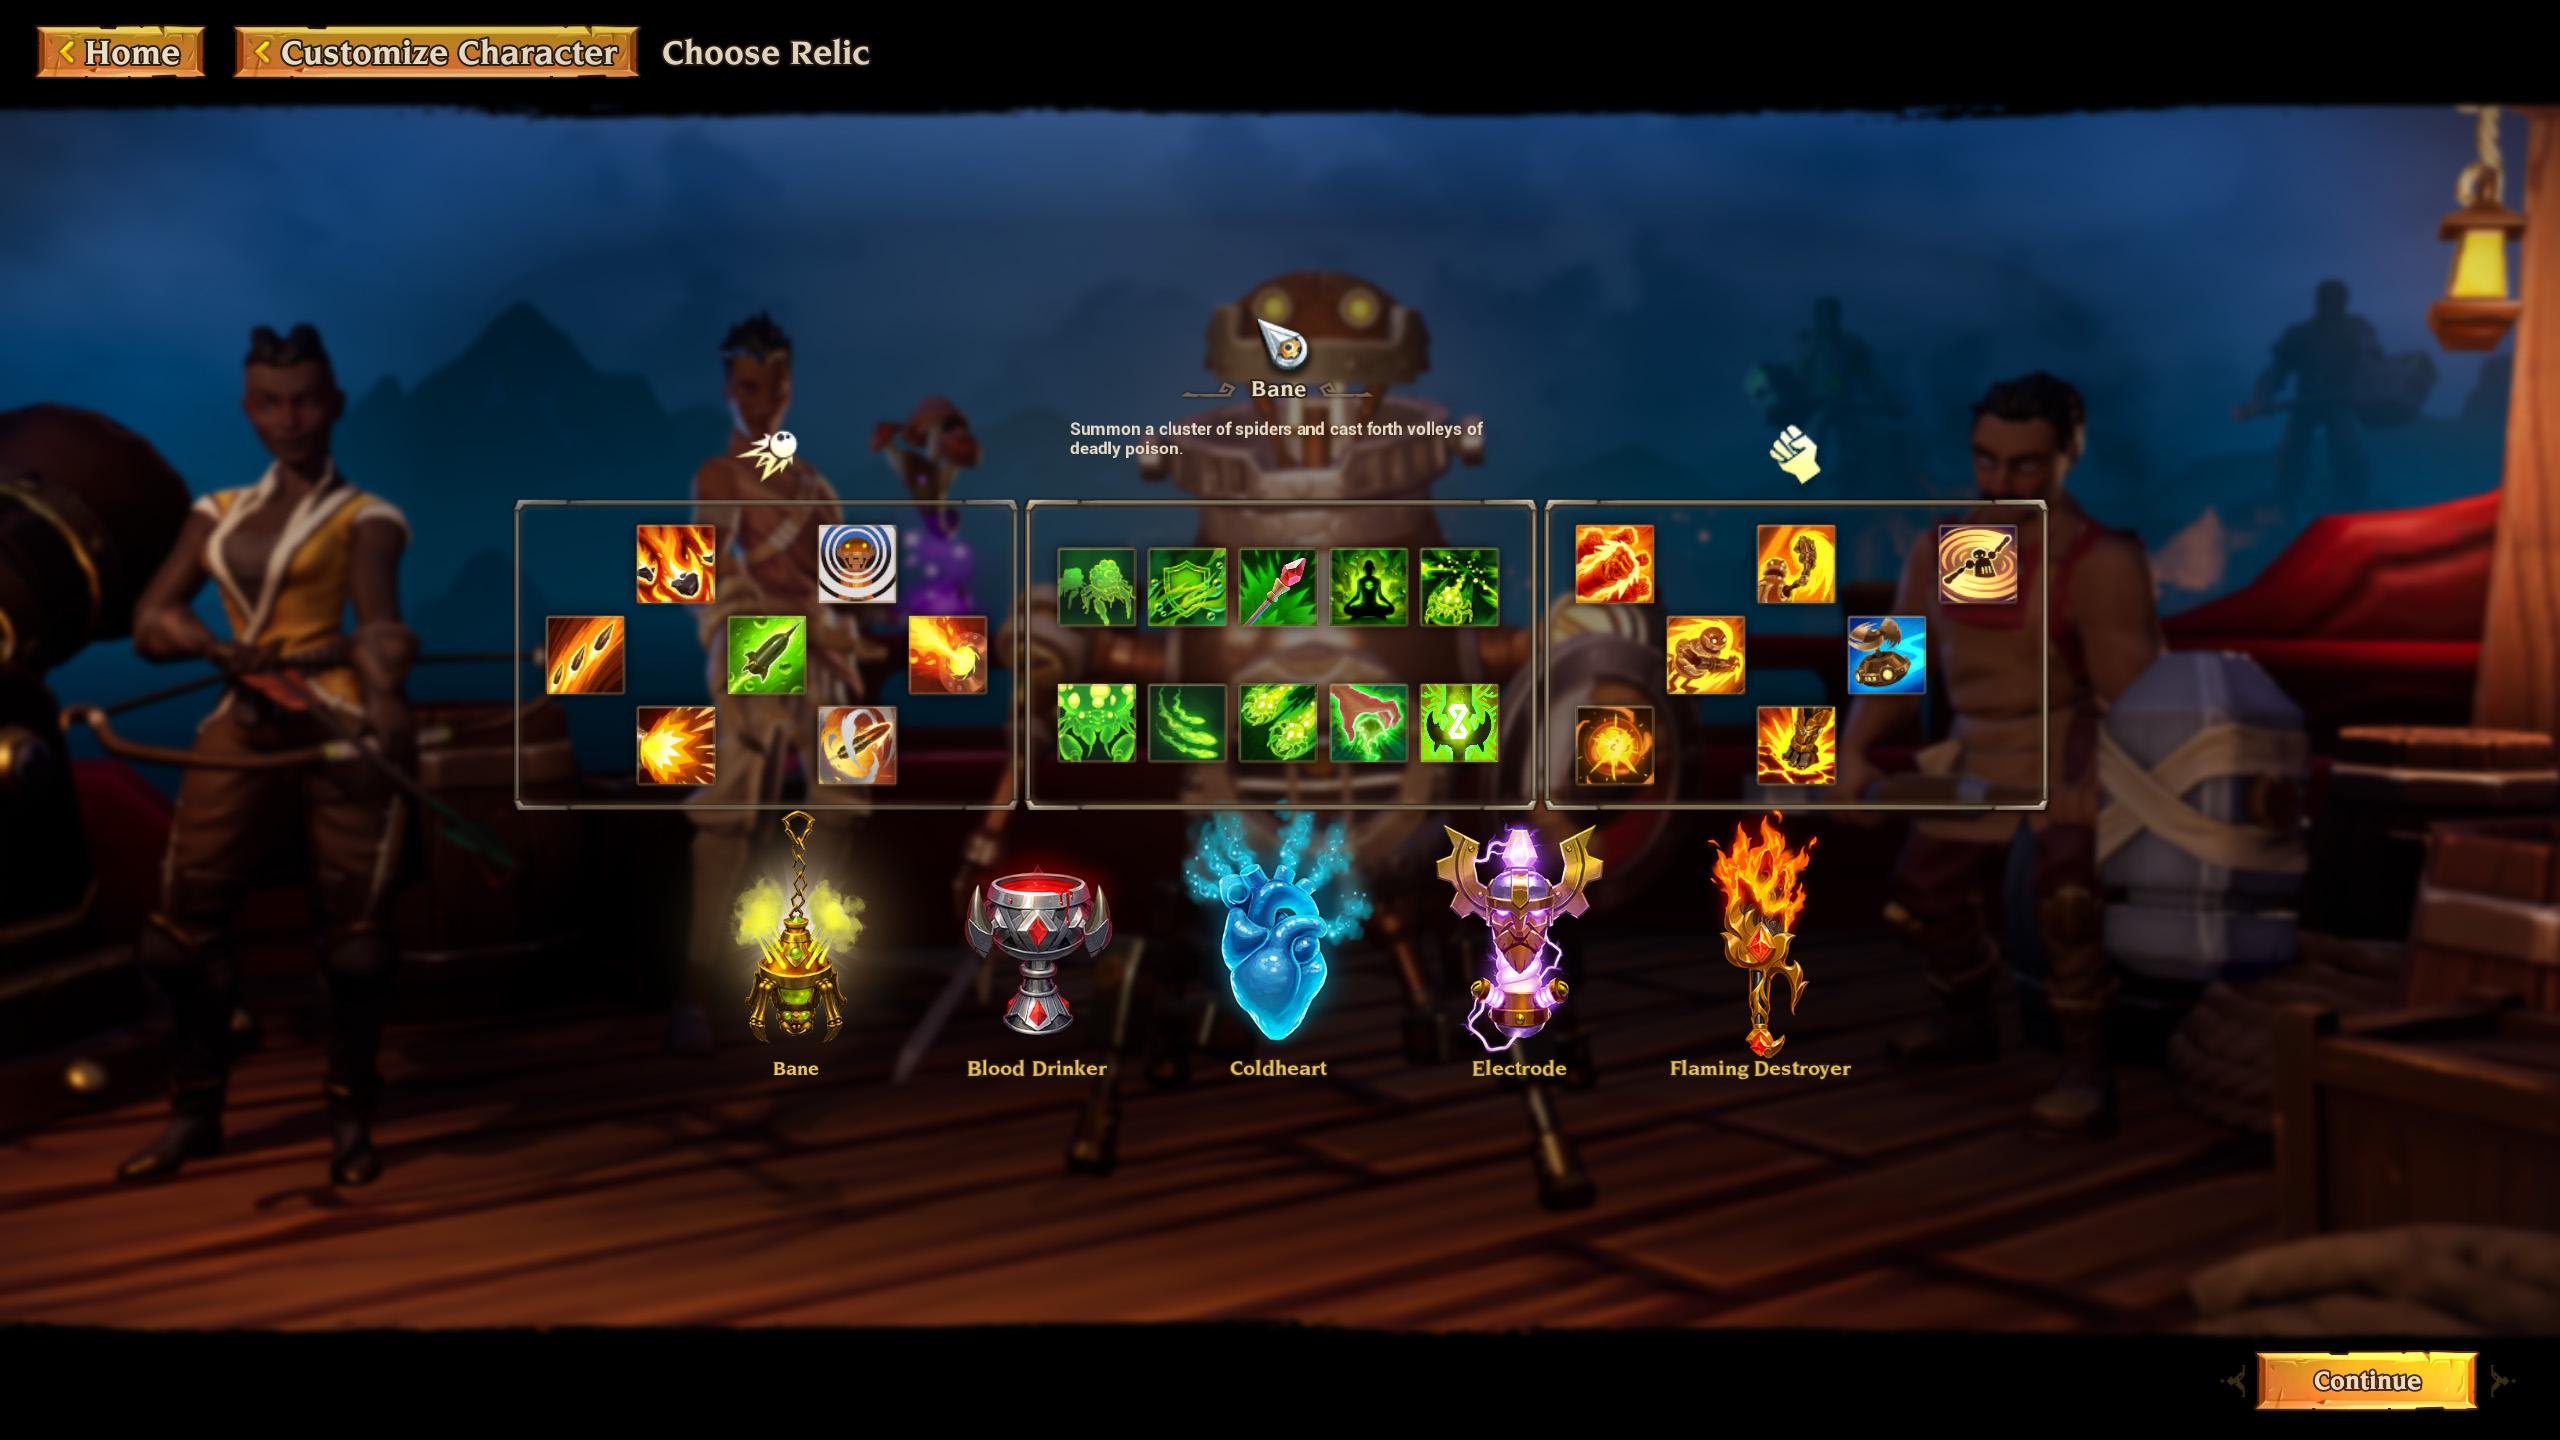 Torchlight 3 pick relic Bane